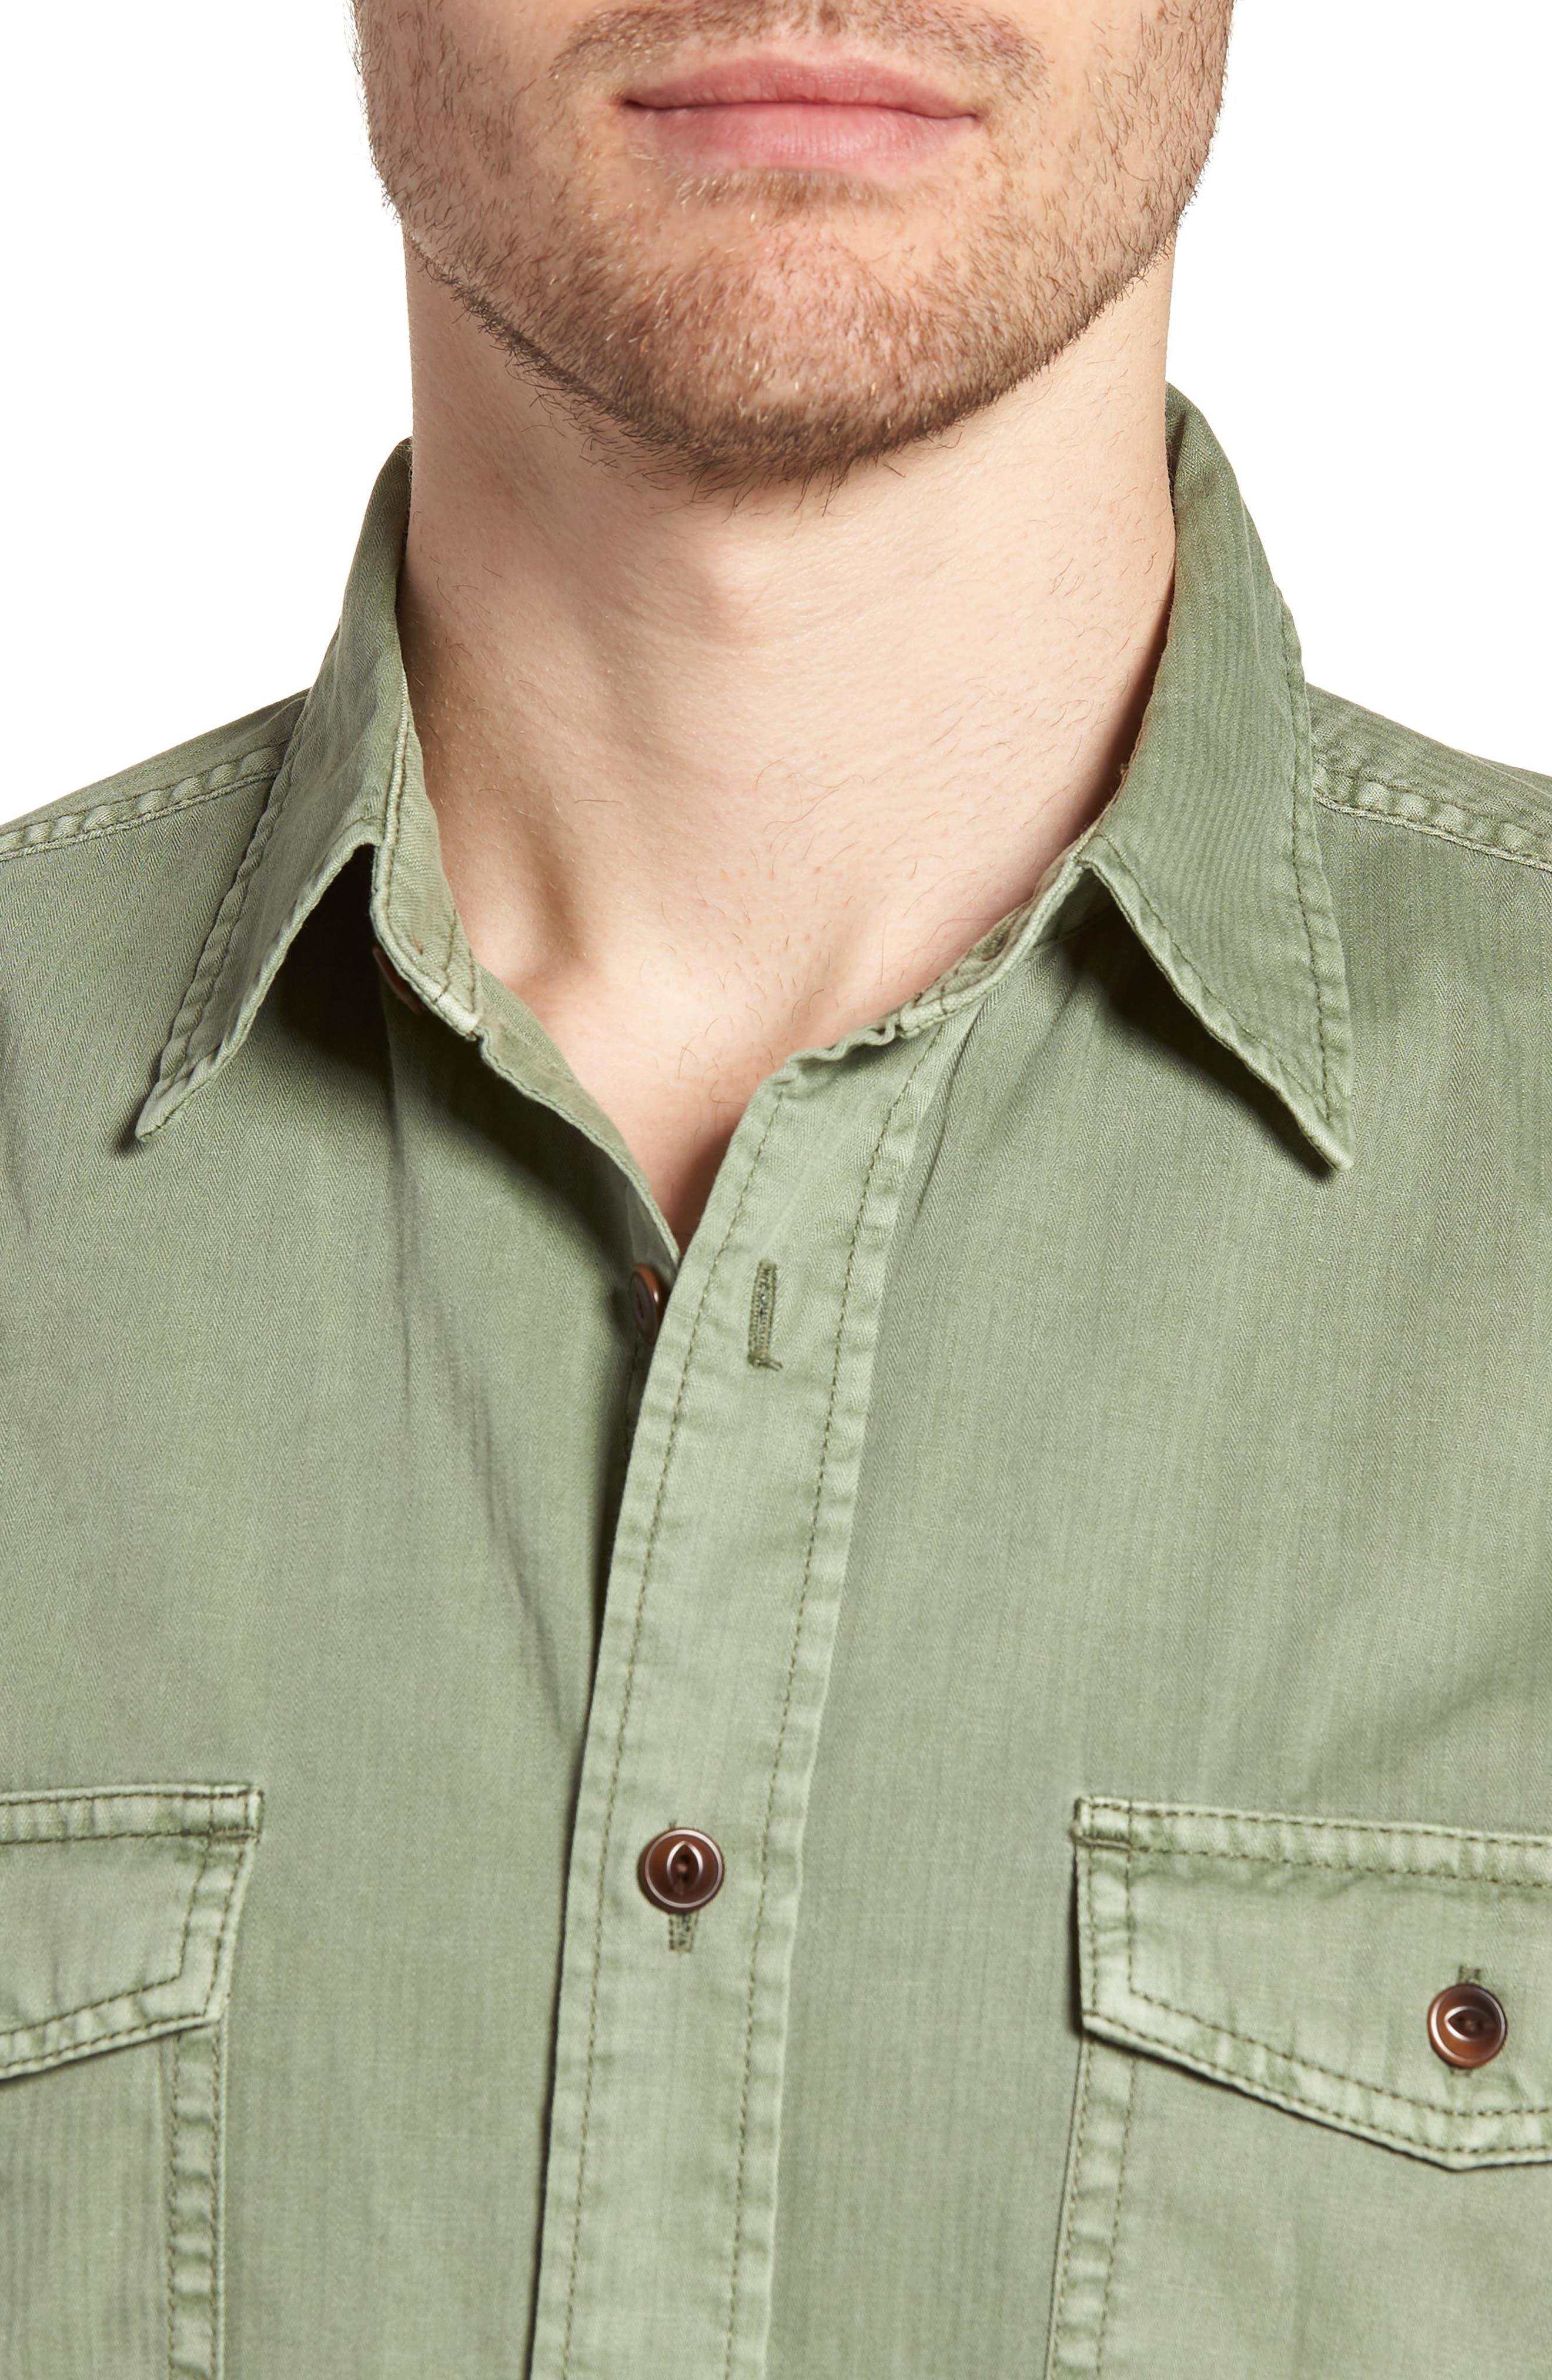 Radar Sport Shirt,                             Alternate thumbnail 4, color,                             Olive